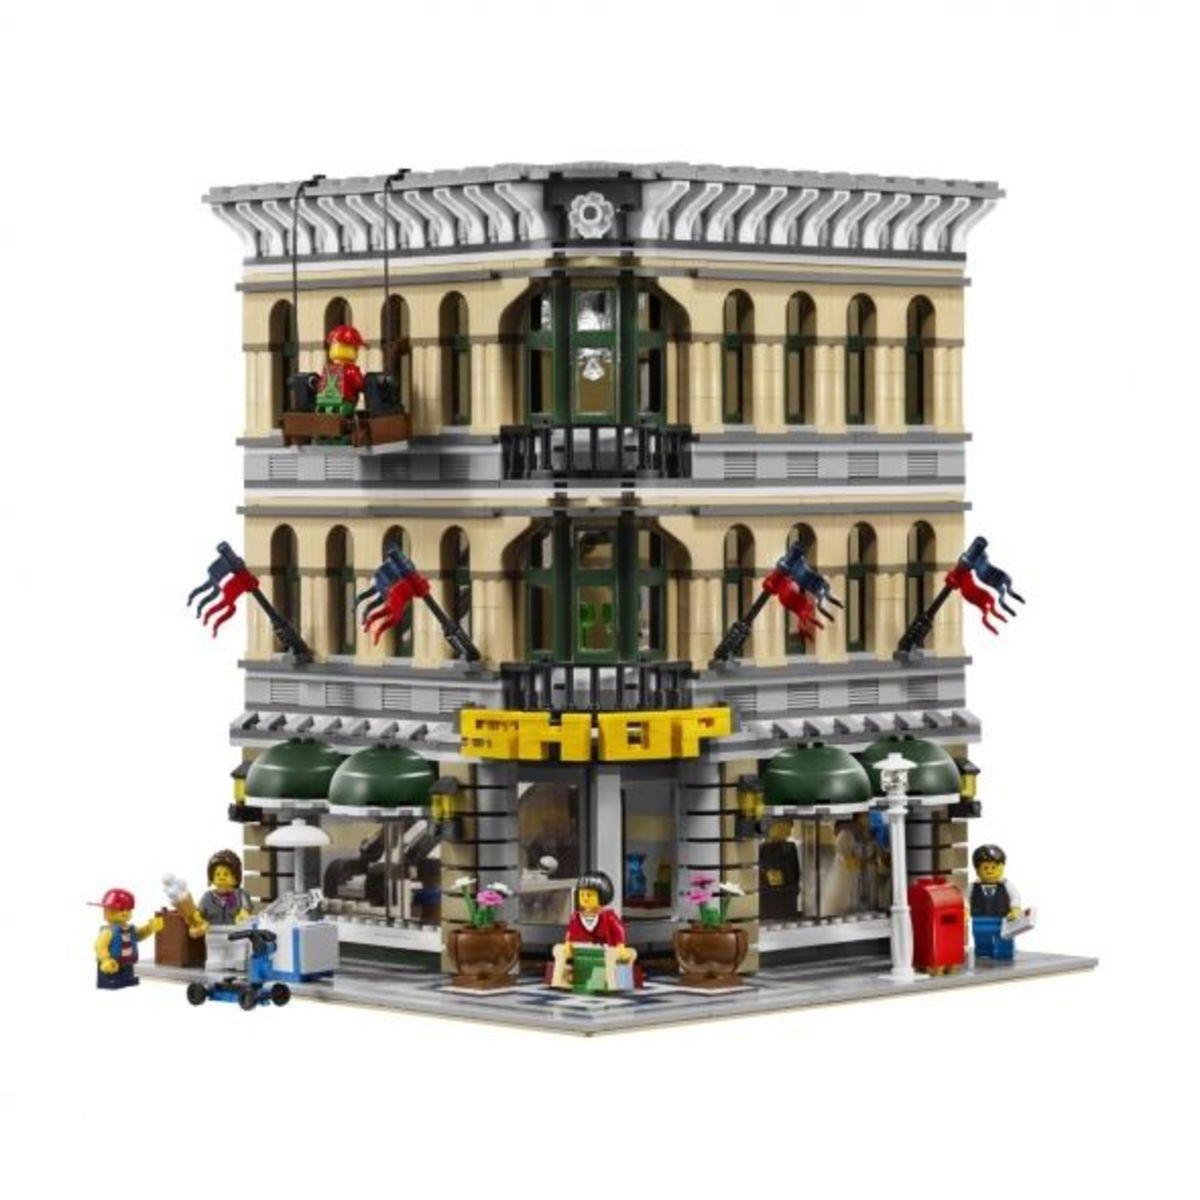 Lego Grand Emporium Set (10211)